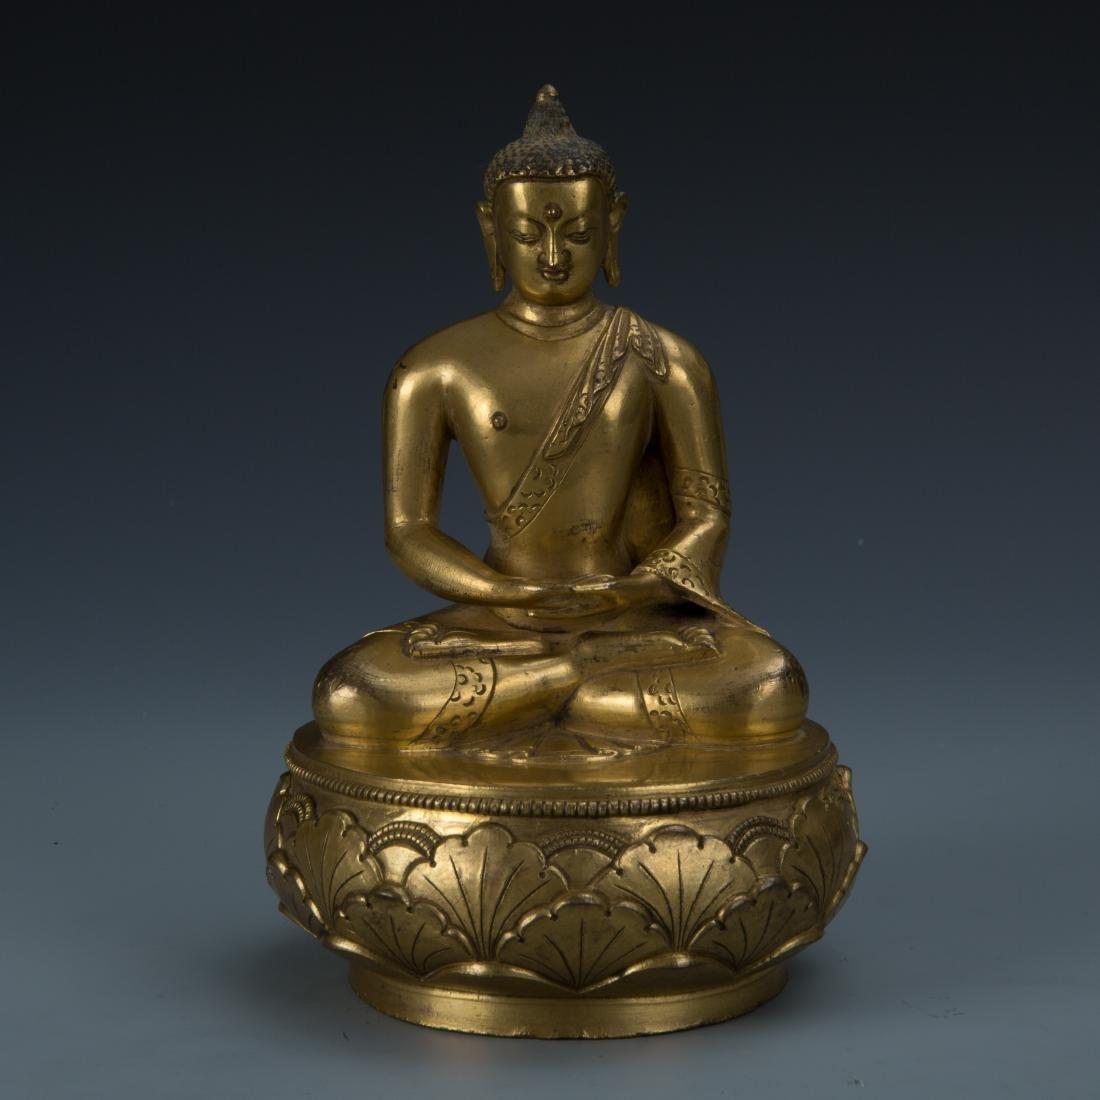 Rare Gilt Bronze Seated Buddha on a Rounded Lotus Base